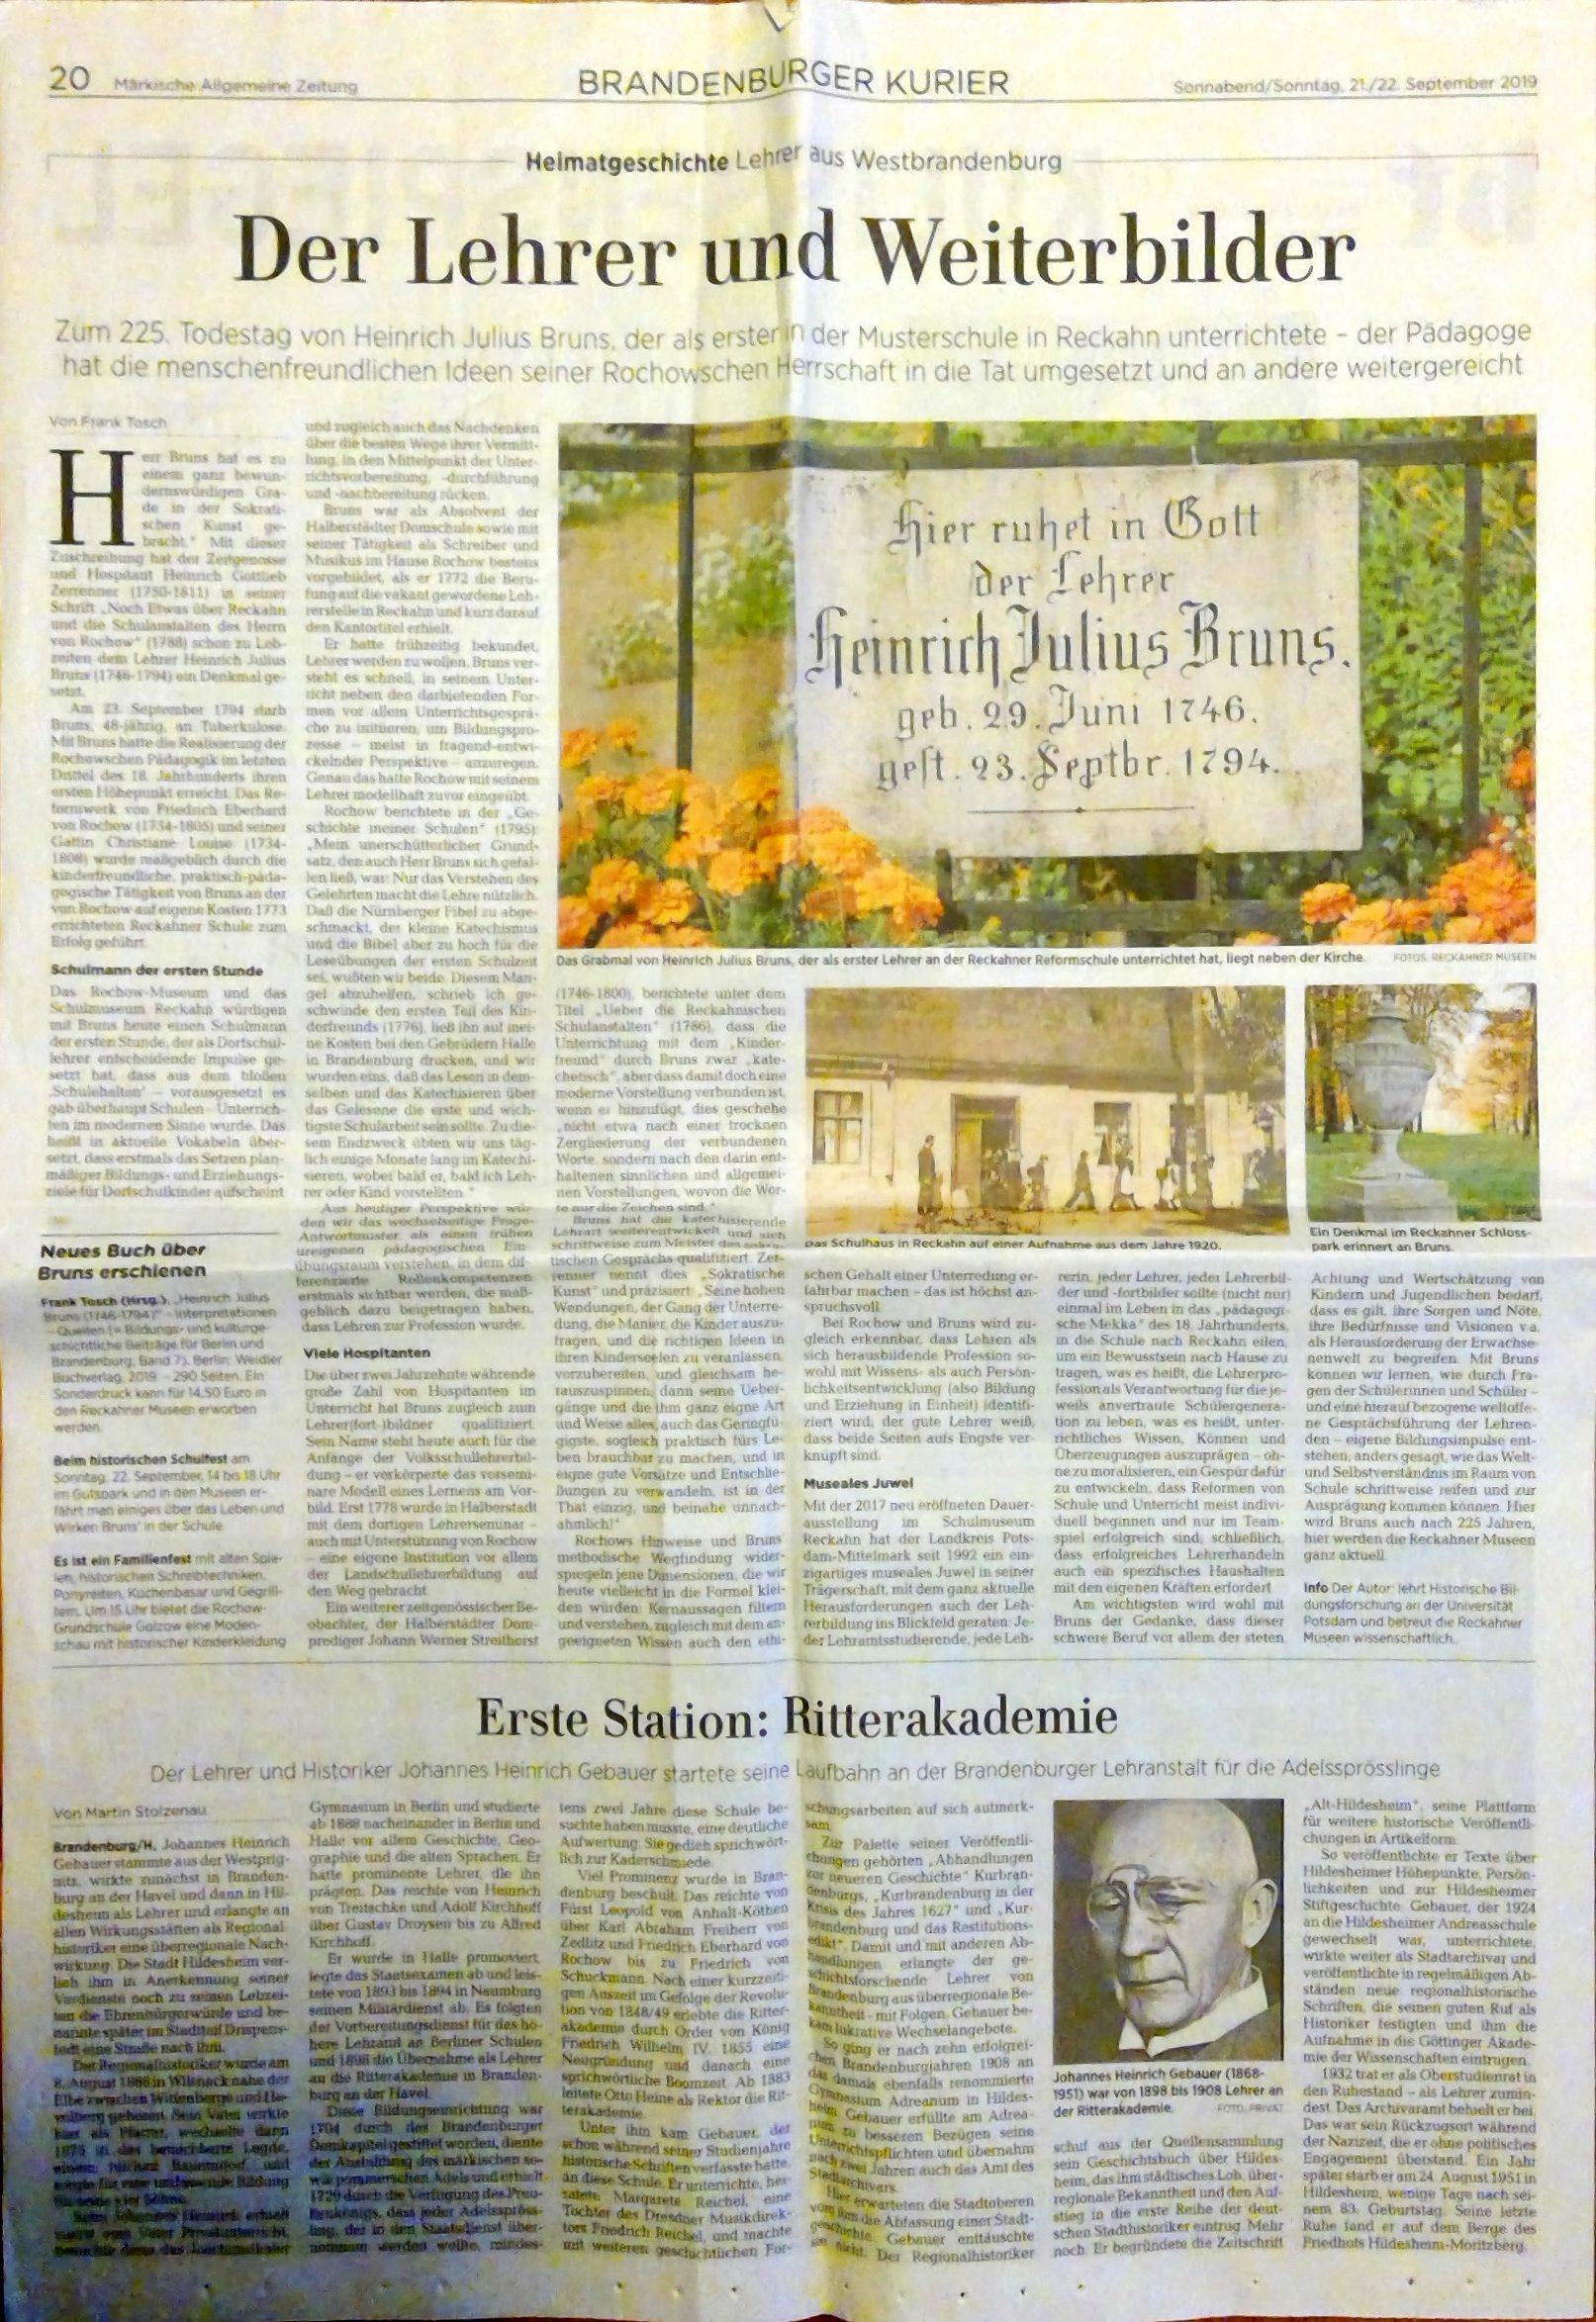 Heinrich Julius Bruns - Namensgeber unserer Schule